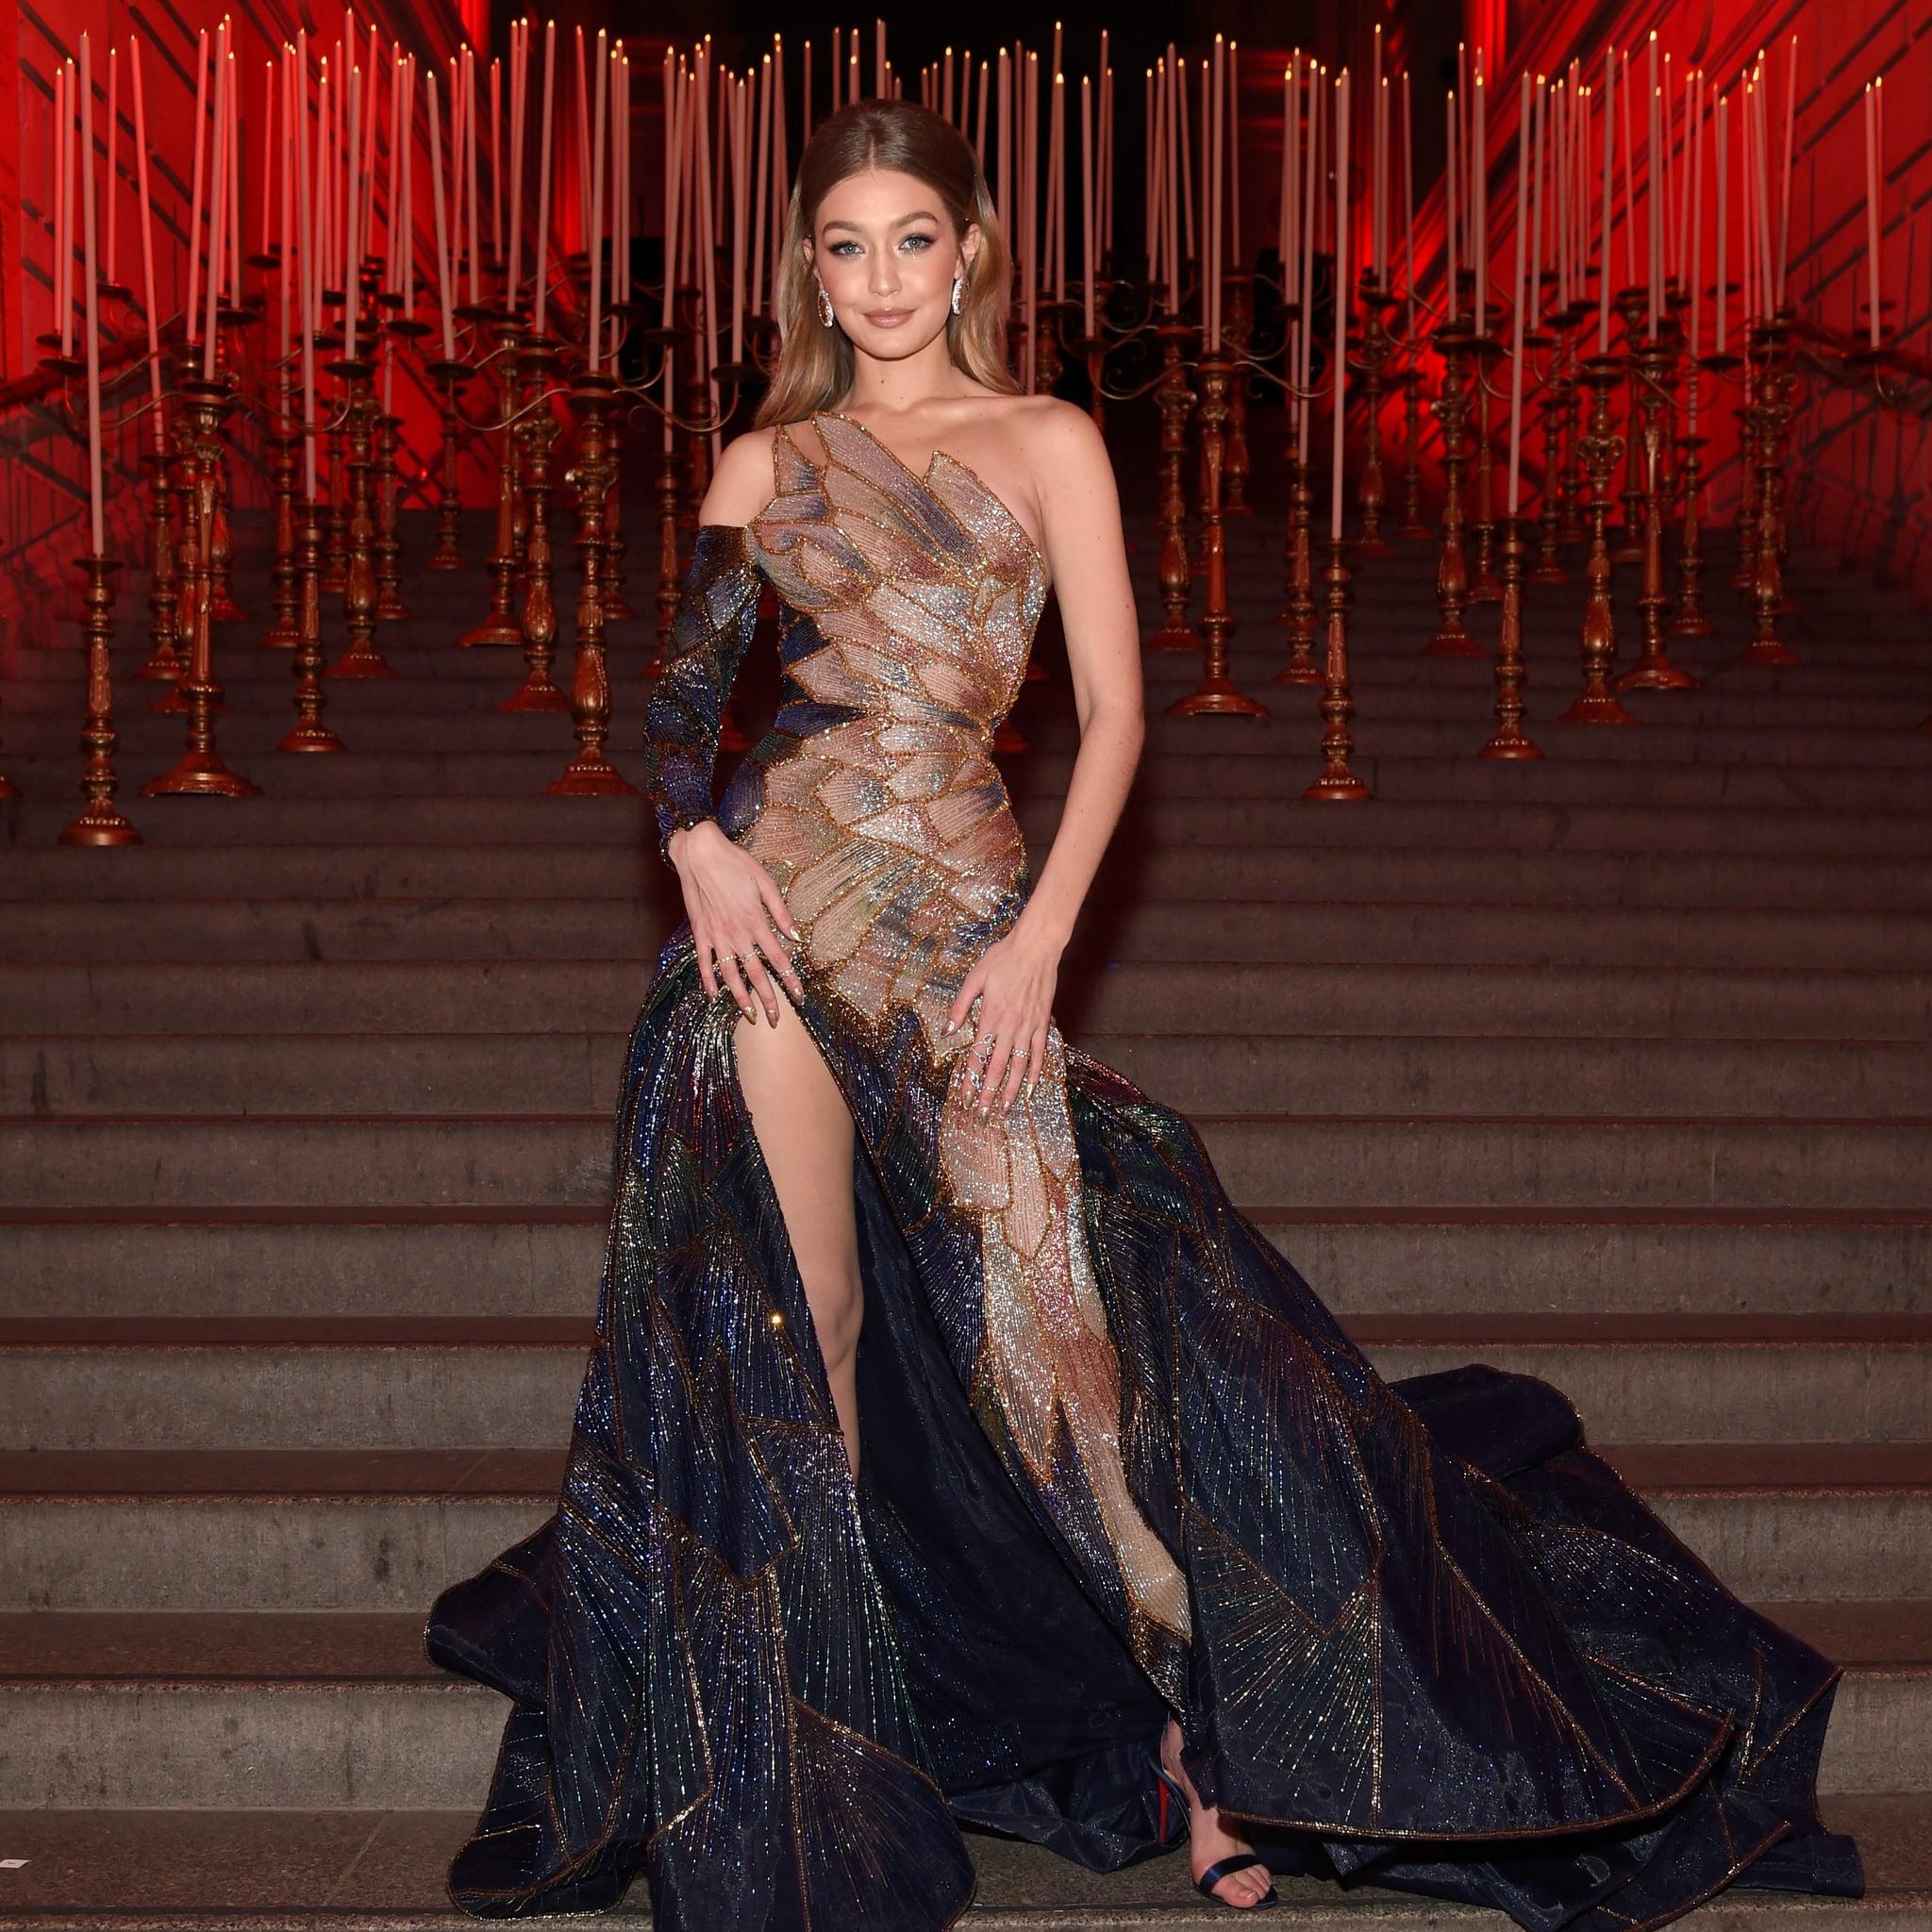 Gigi Hadid in Versace at the 2018 Met Gala | POPSUGAR Fashion